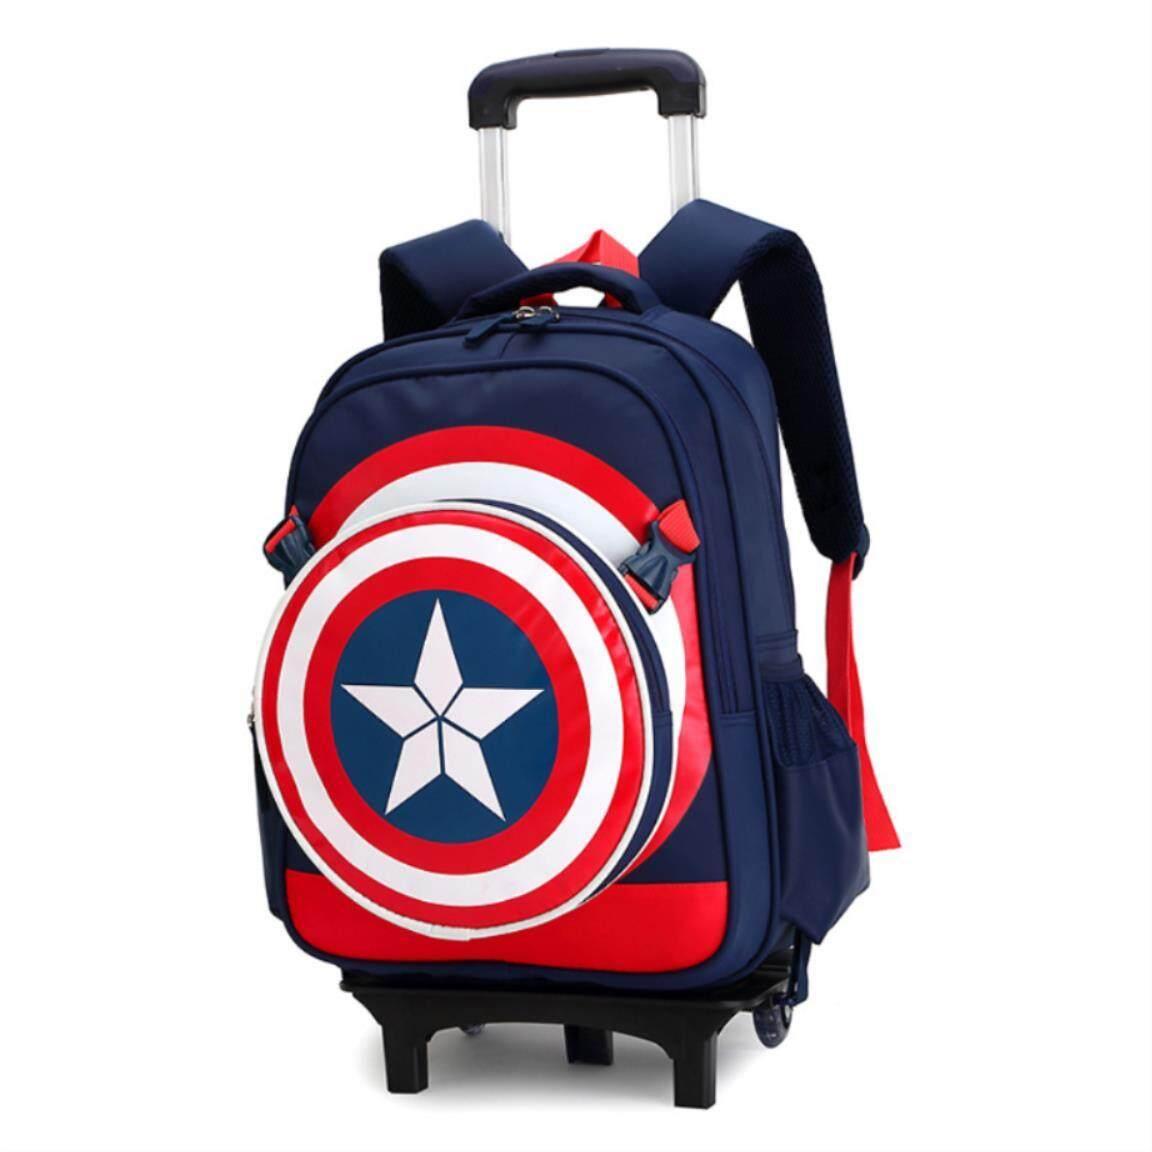 FO Primary School Trolley Bags Captain America Backpack Wheeled Children School Bag. Wheels; Schoolbags. Trolley